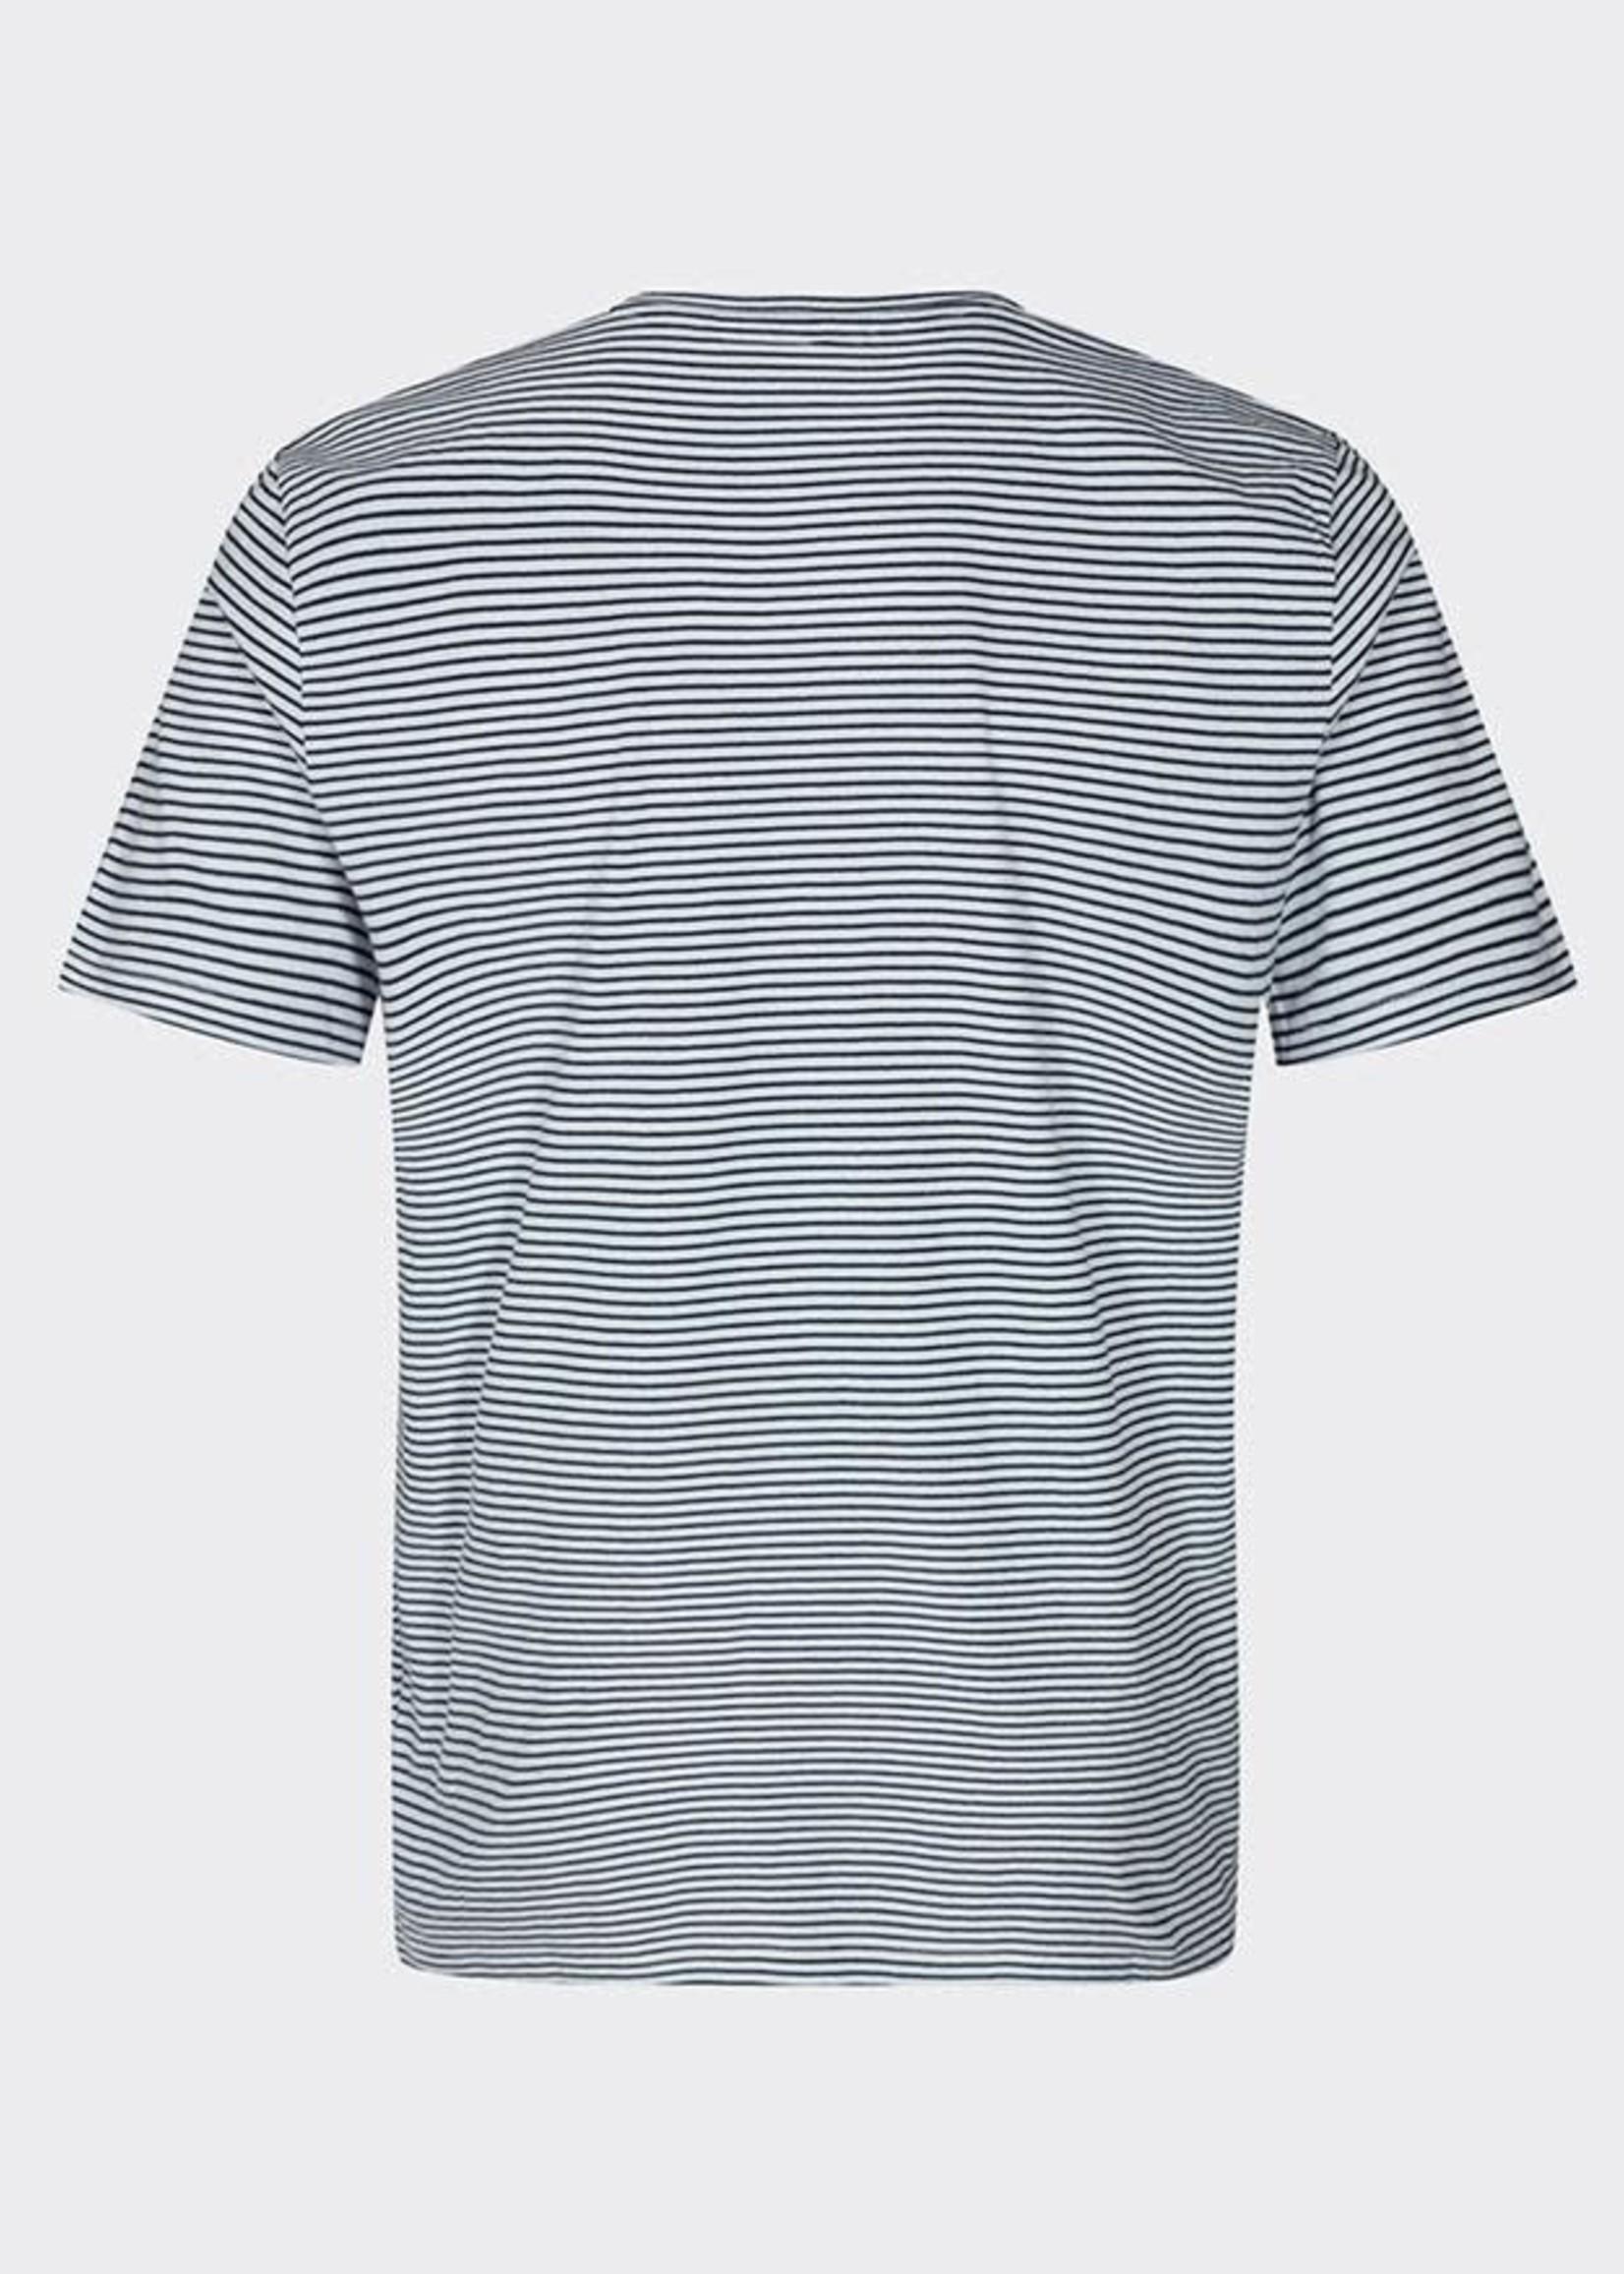 MINIMUM Minimum LUKA White striped